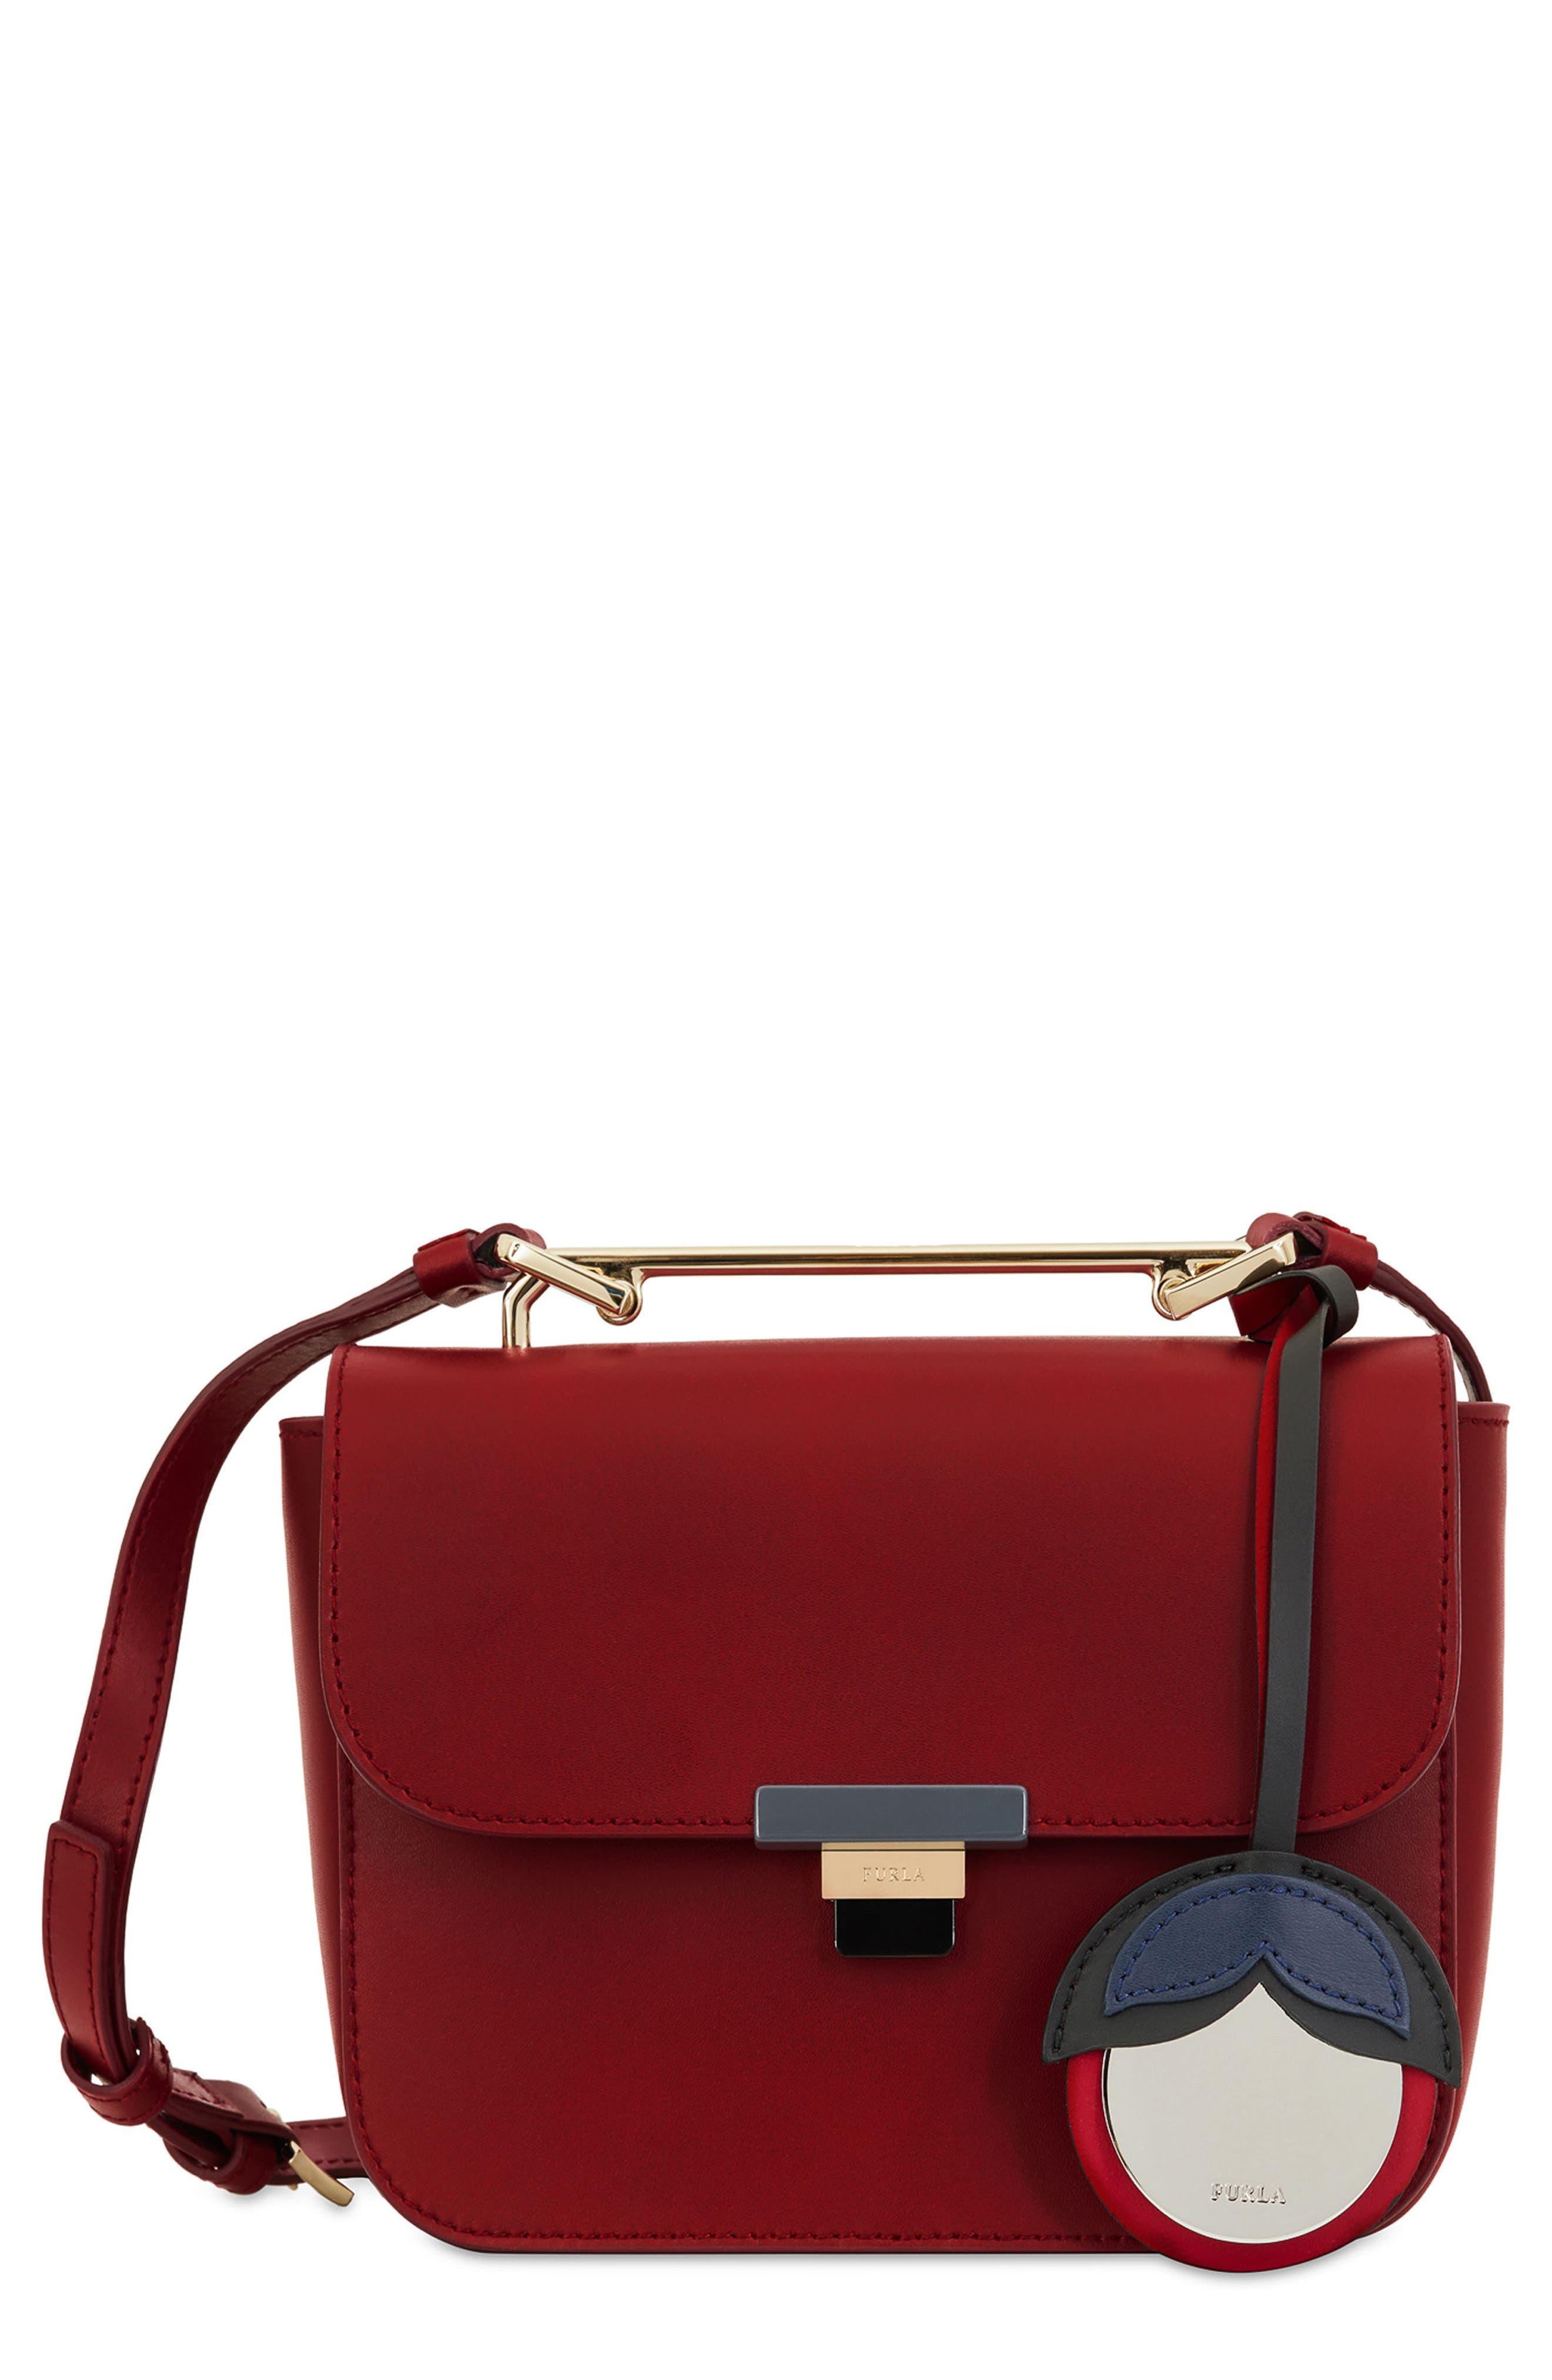 Elisir Mini Crossbody Bag,                             Main thumbnail 1, color,                             Ciliegia